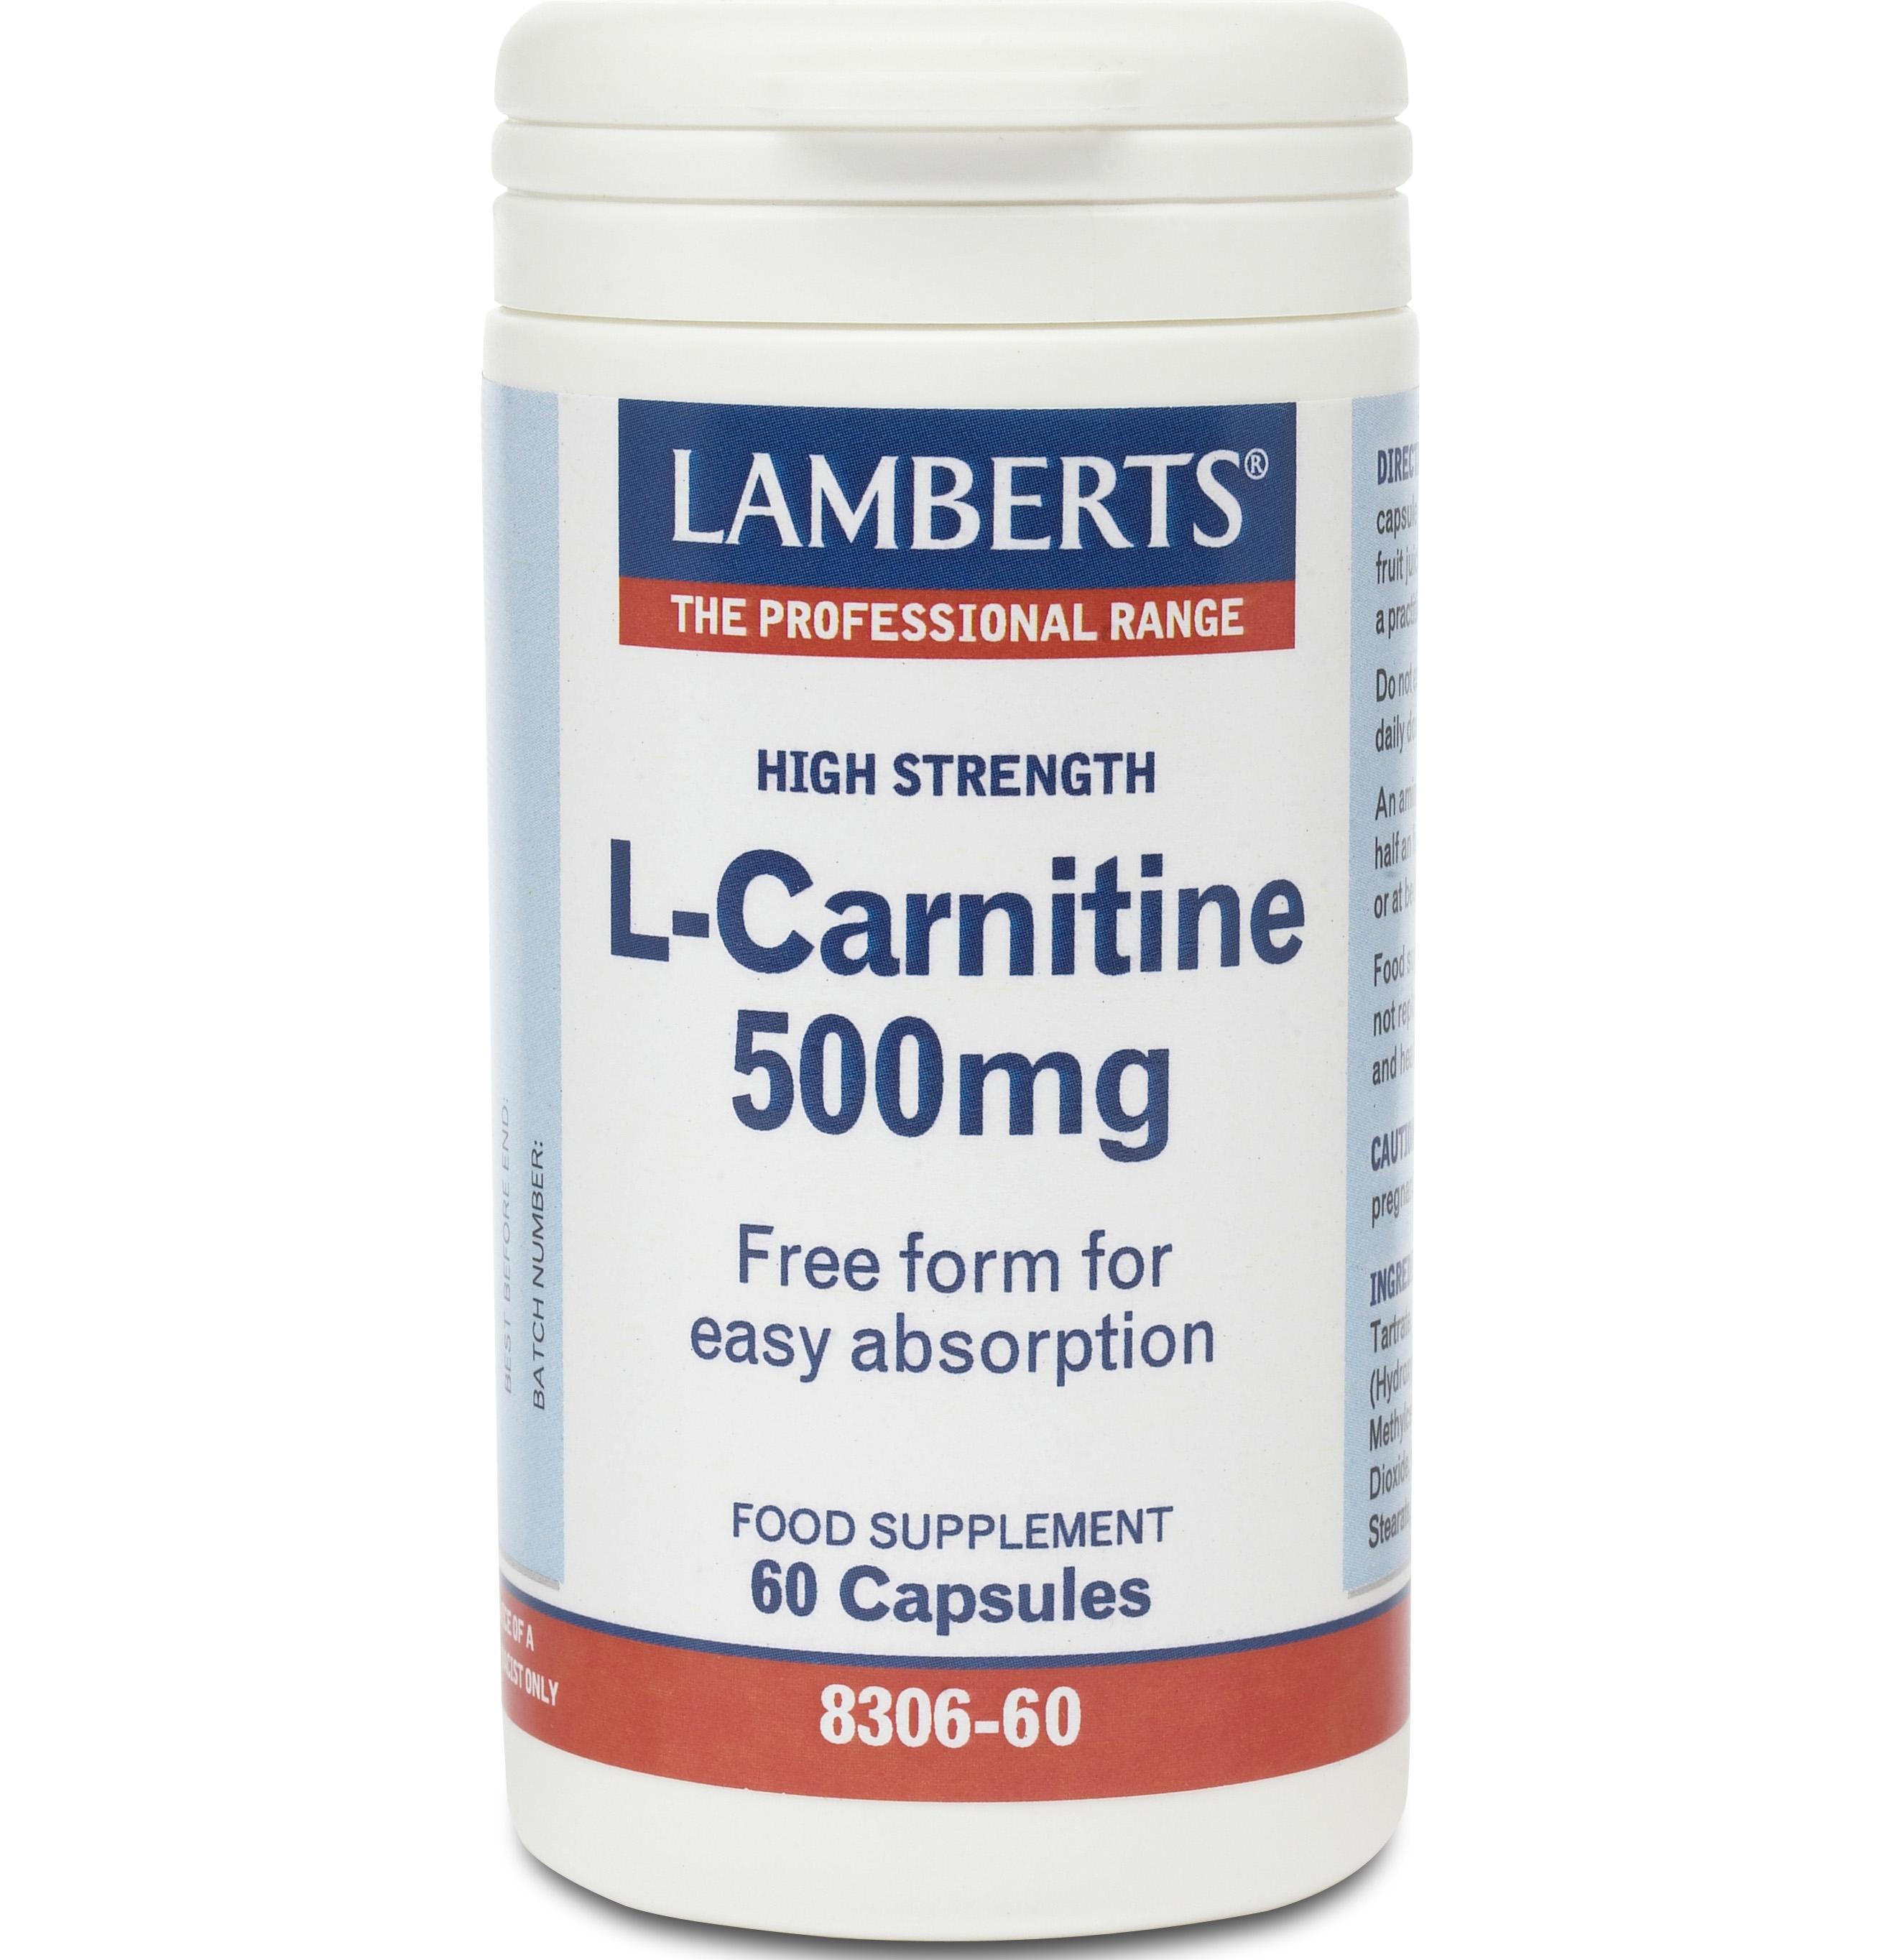 Lamberts L -Carnitine 500mg Καρνιτίνη Bοηθάει Στη Διαδικασία Της Θερμογένεσης 60 caps